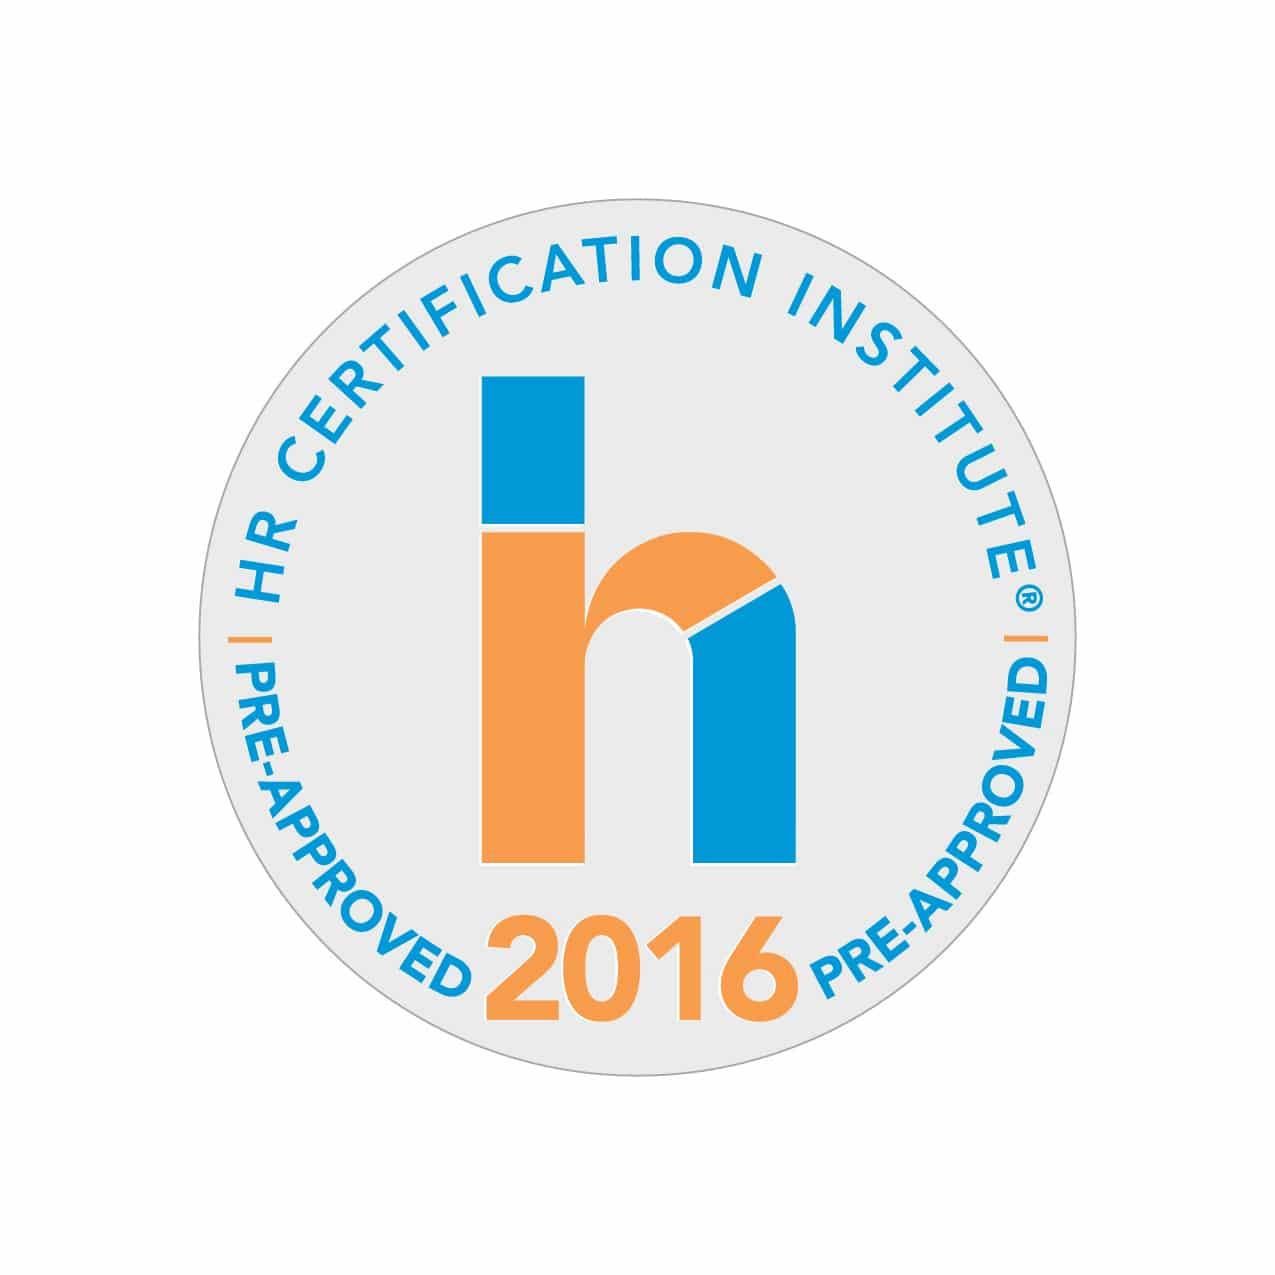 ... HR Certification Institute's® (HRCI®) criteria for re